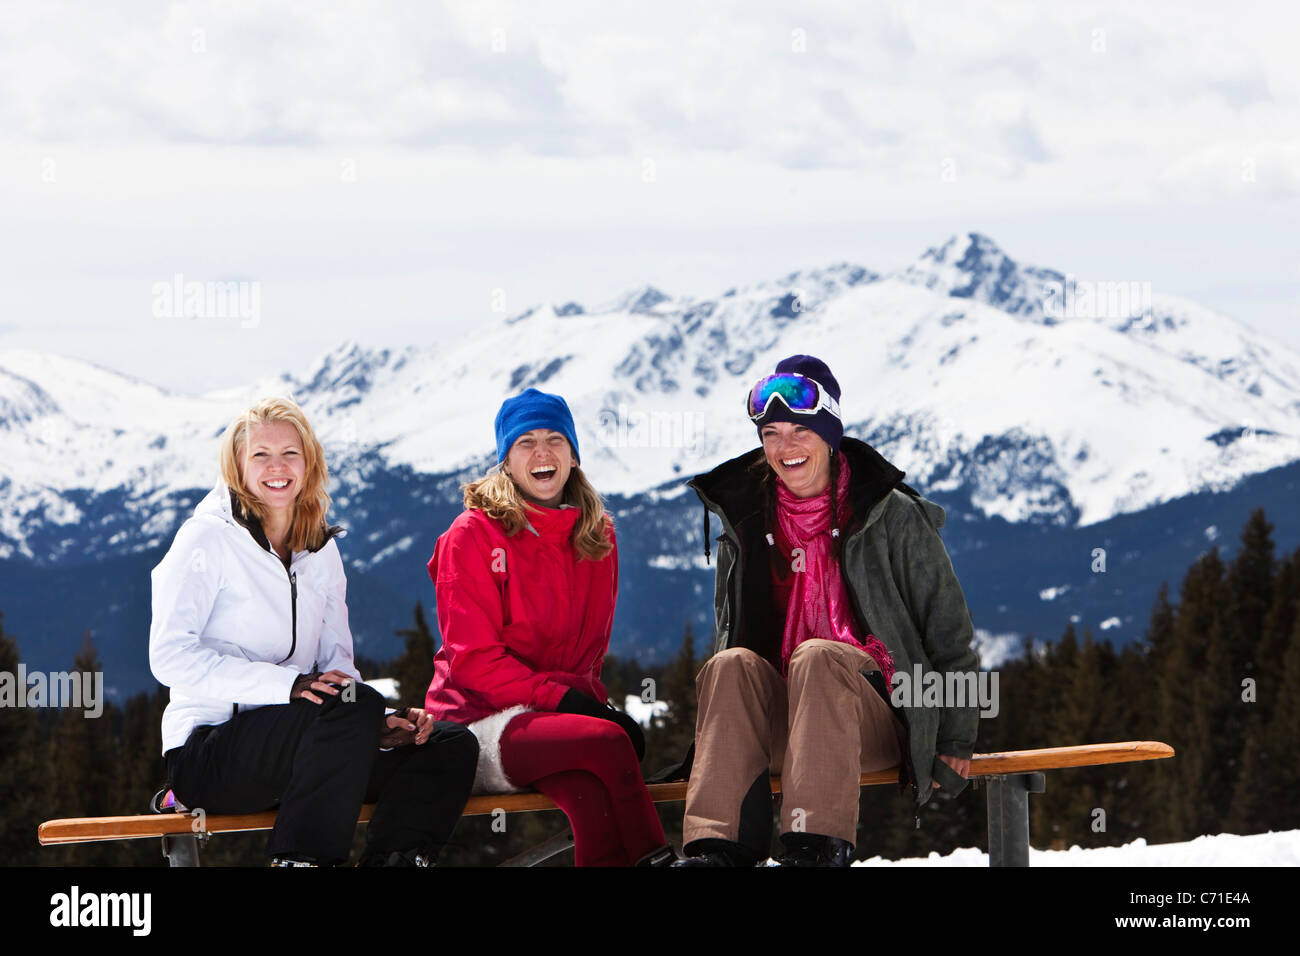 Three beautiful women laugh and smile while enjoying a fun ski day in Colorado. - Stock Image